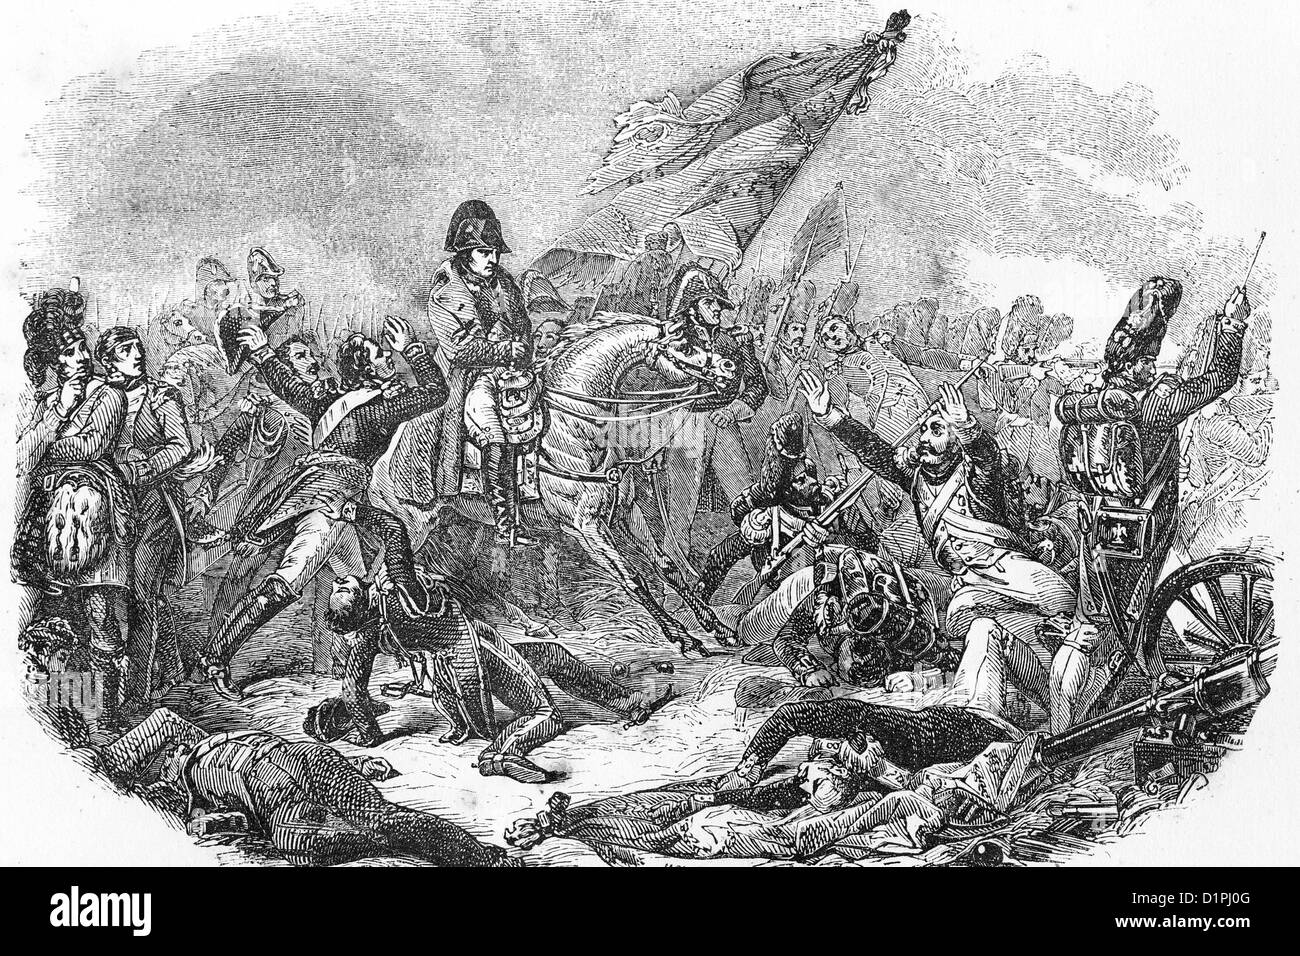 Napoleon Bonaparte (1769-1821), emperor of France. Battle of Waterloo, 18thJune 1815. Antique illustration, 1855. - Stock Image